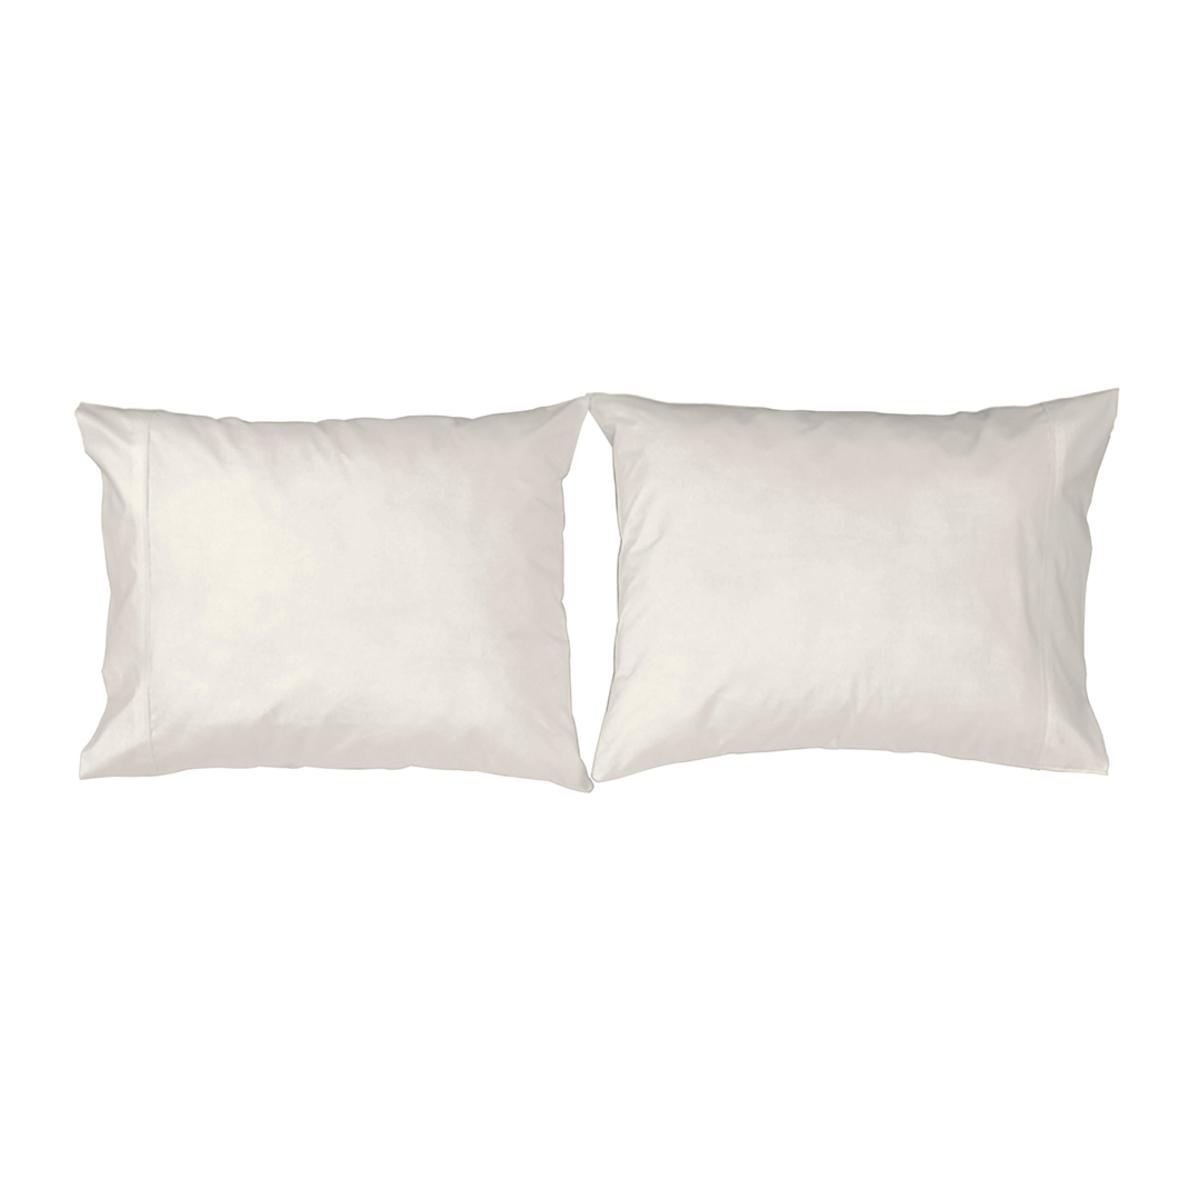 2 taies d'oreiller en coton beige 50x75